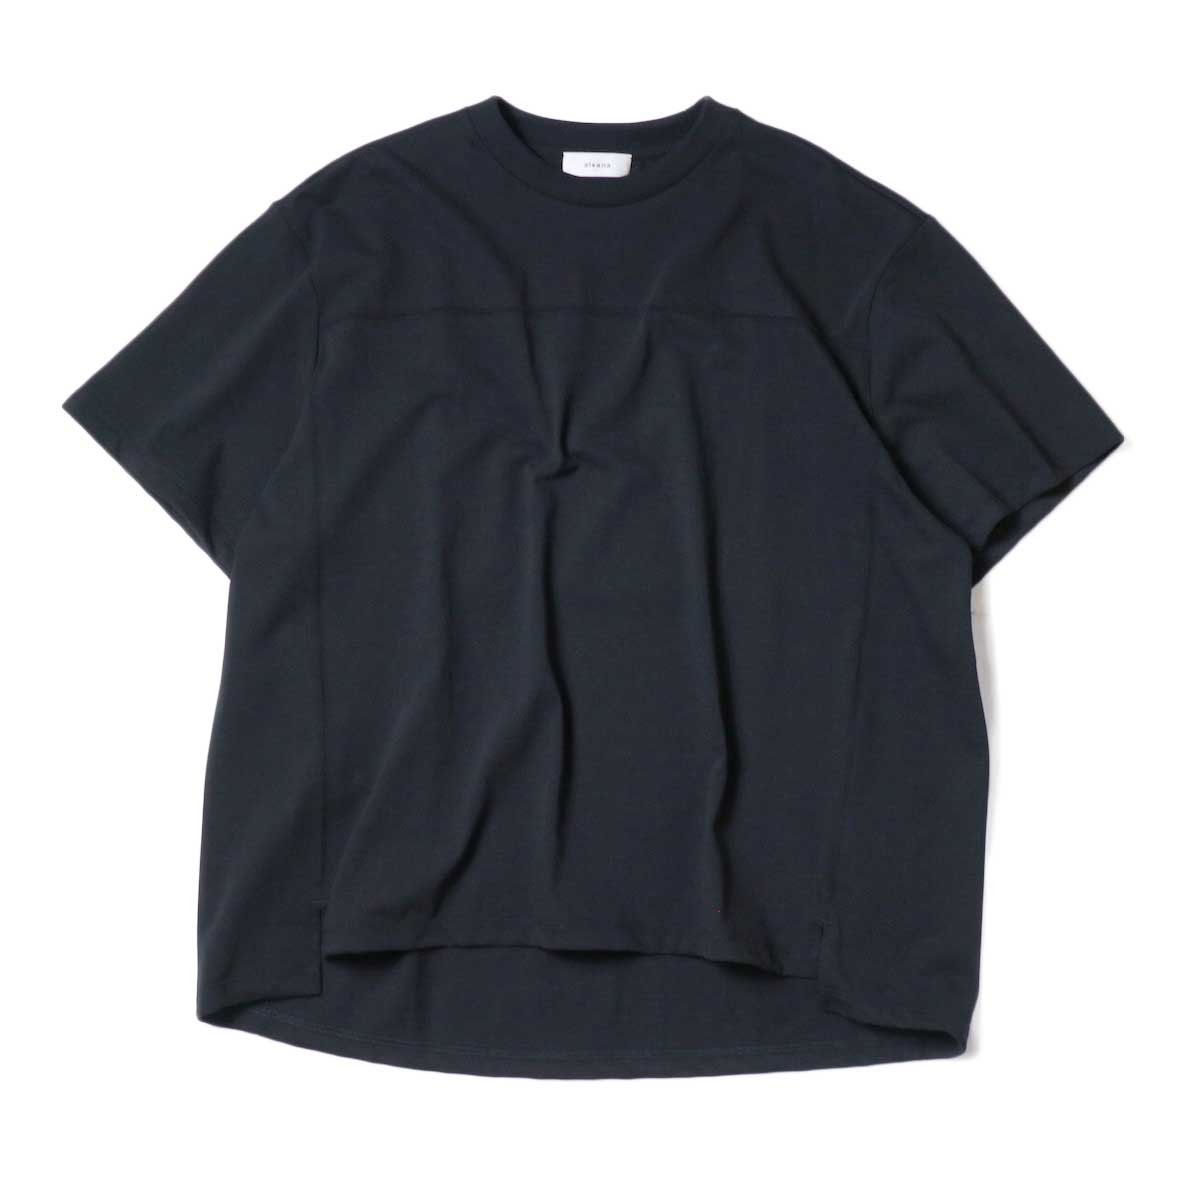 alvana / Protect Football S/S Tee (Black)